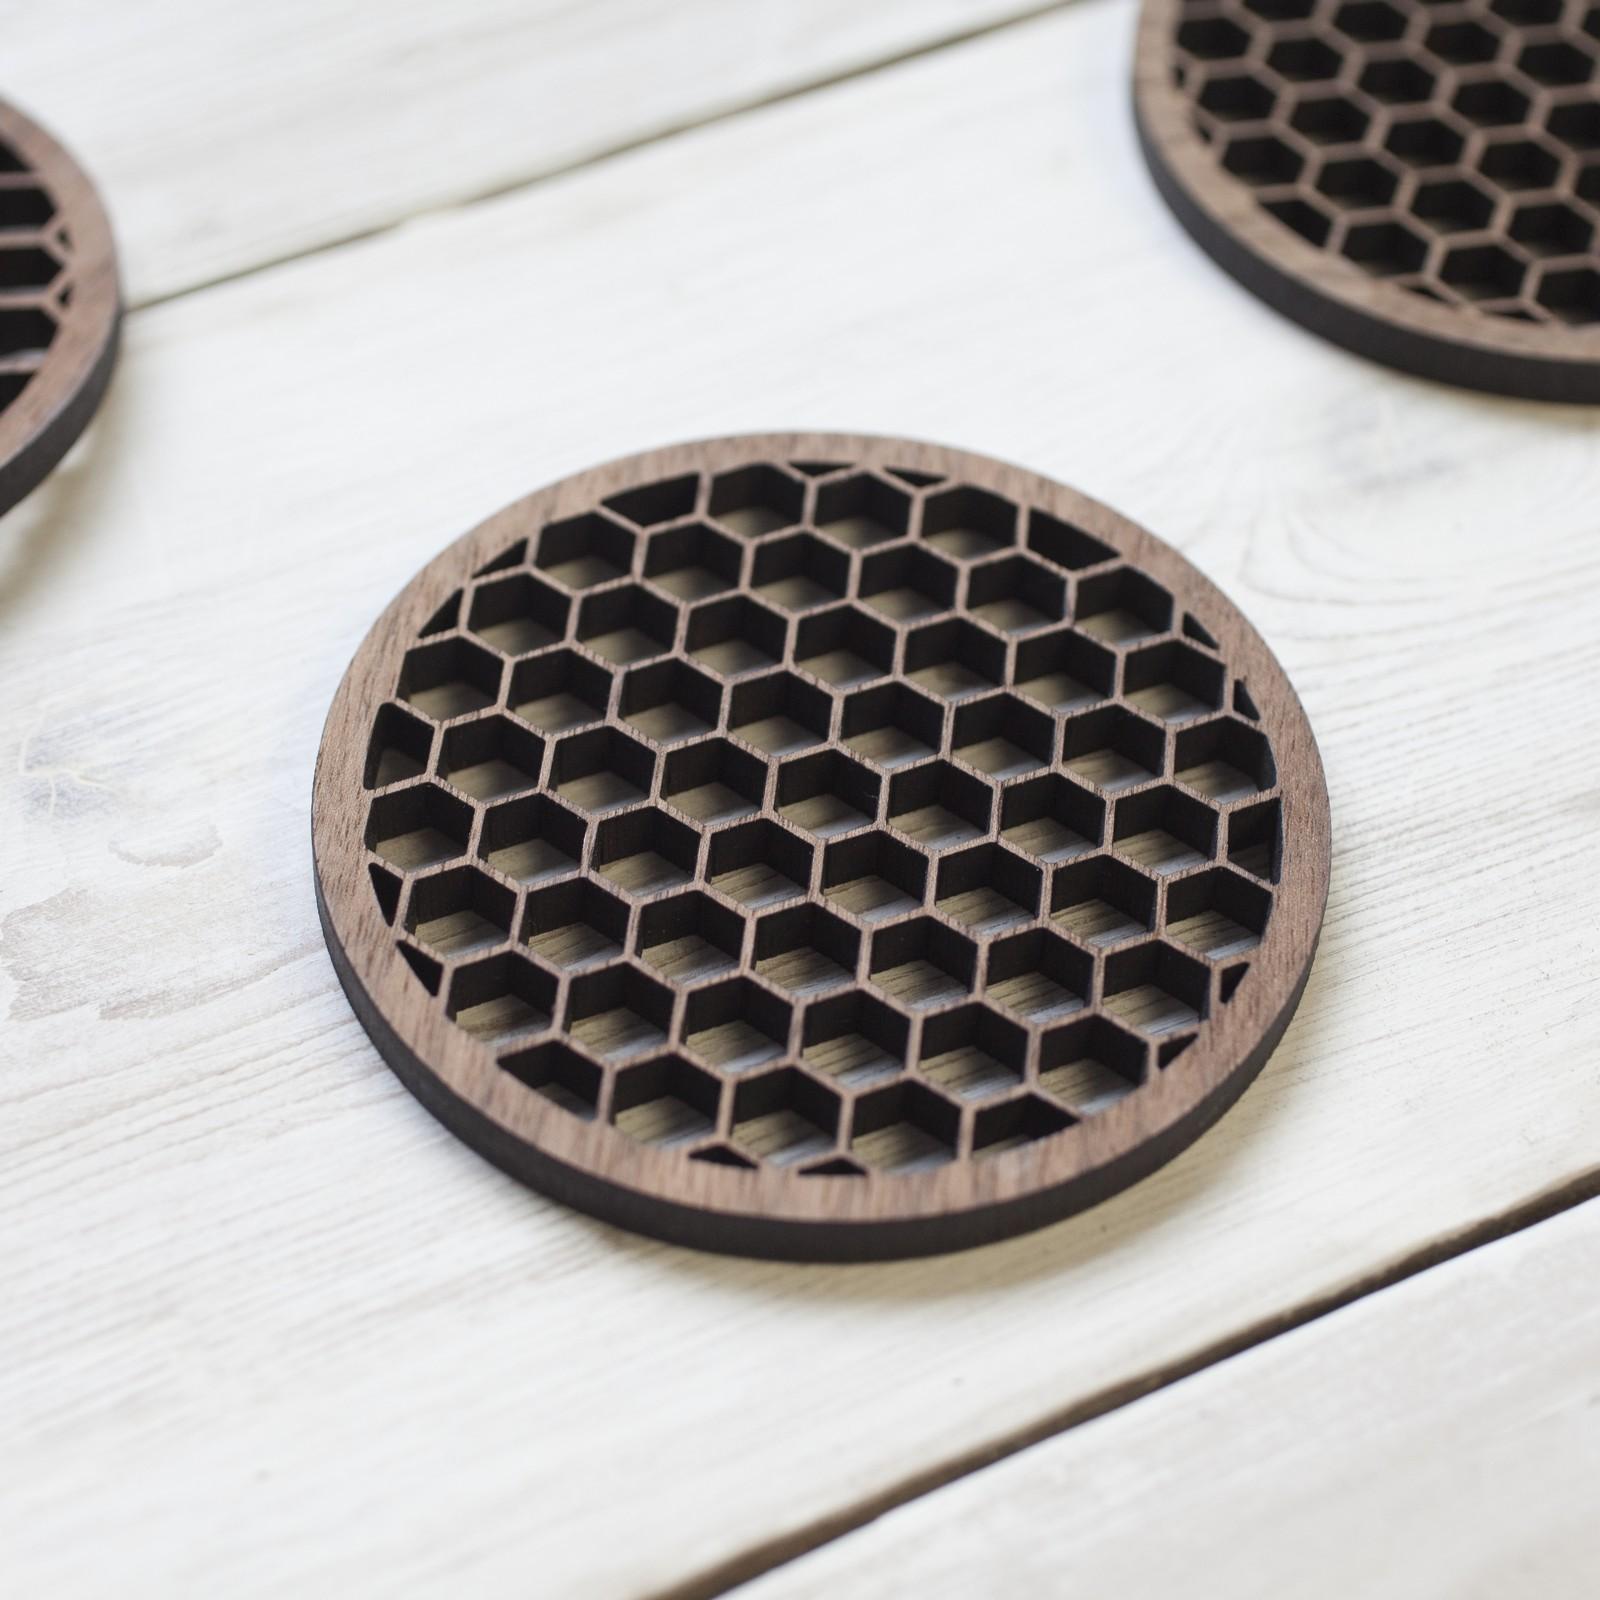 Denvers-Designs-Geometric-Honeycomb-Coaster-1.jpg